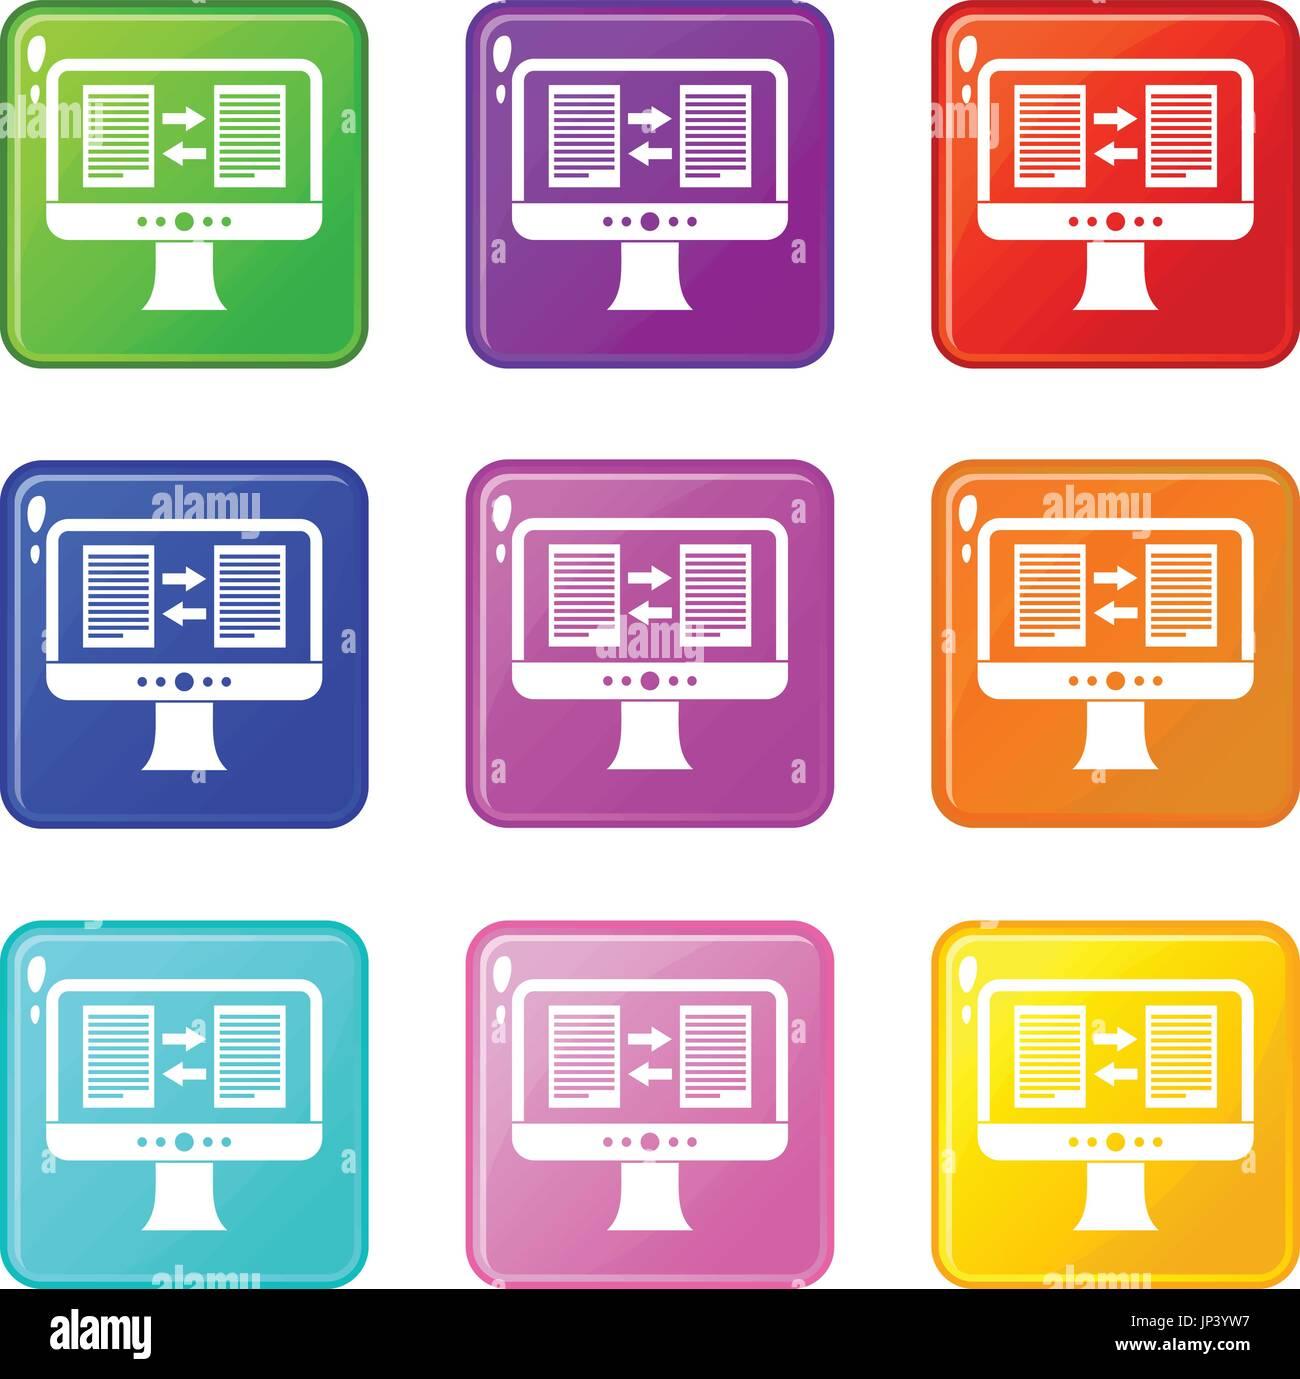 Pc Translator Stock Photos & Pc Translator Stock Images - Page 3 - Alamy